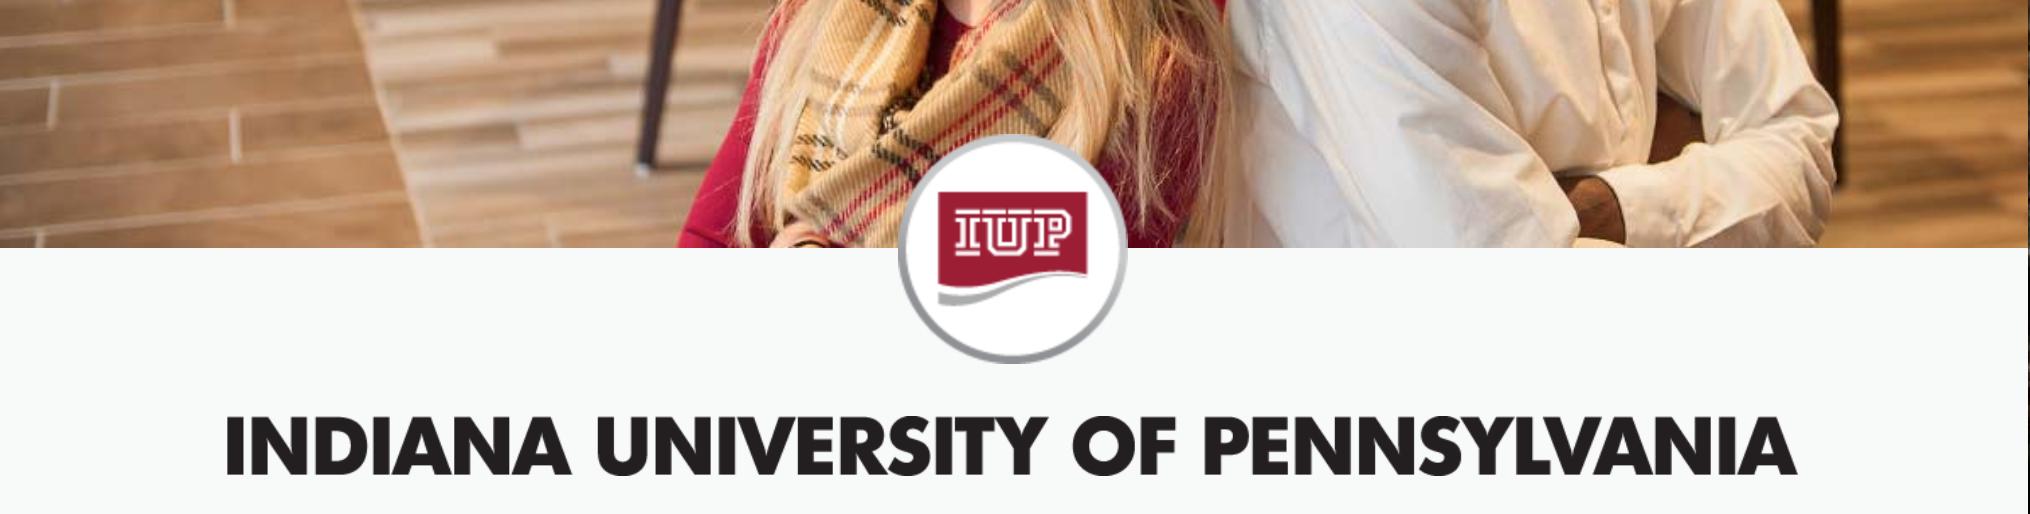 Indiana University of Pennsylvania